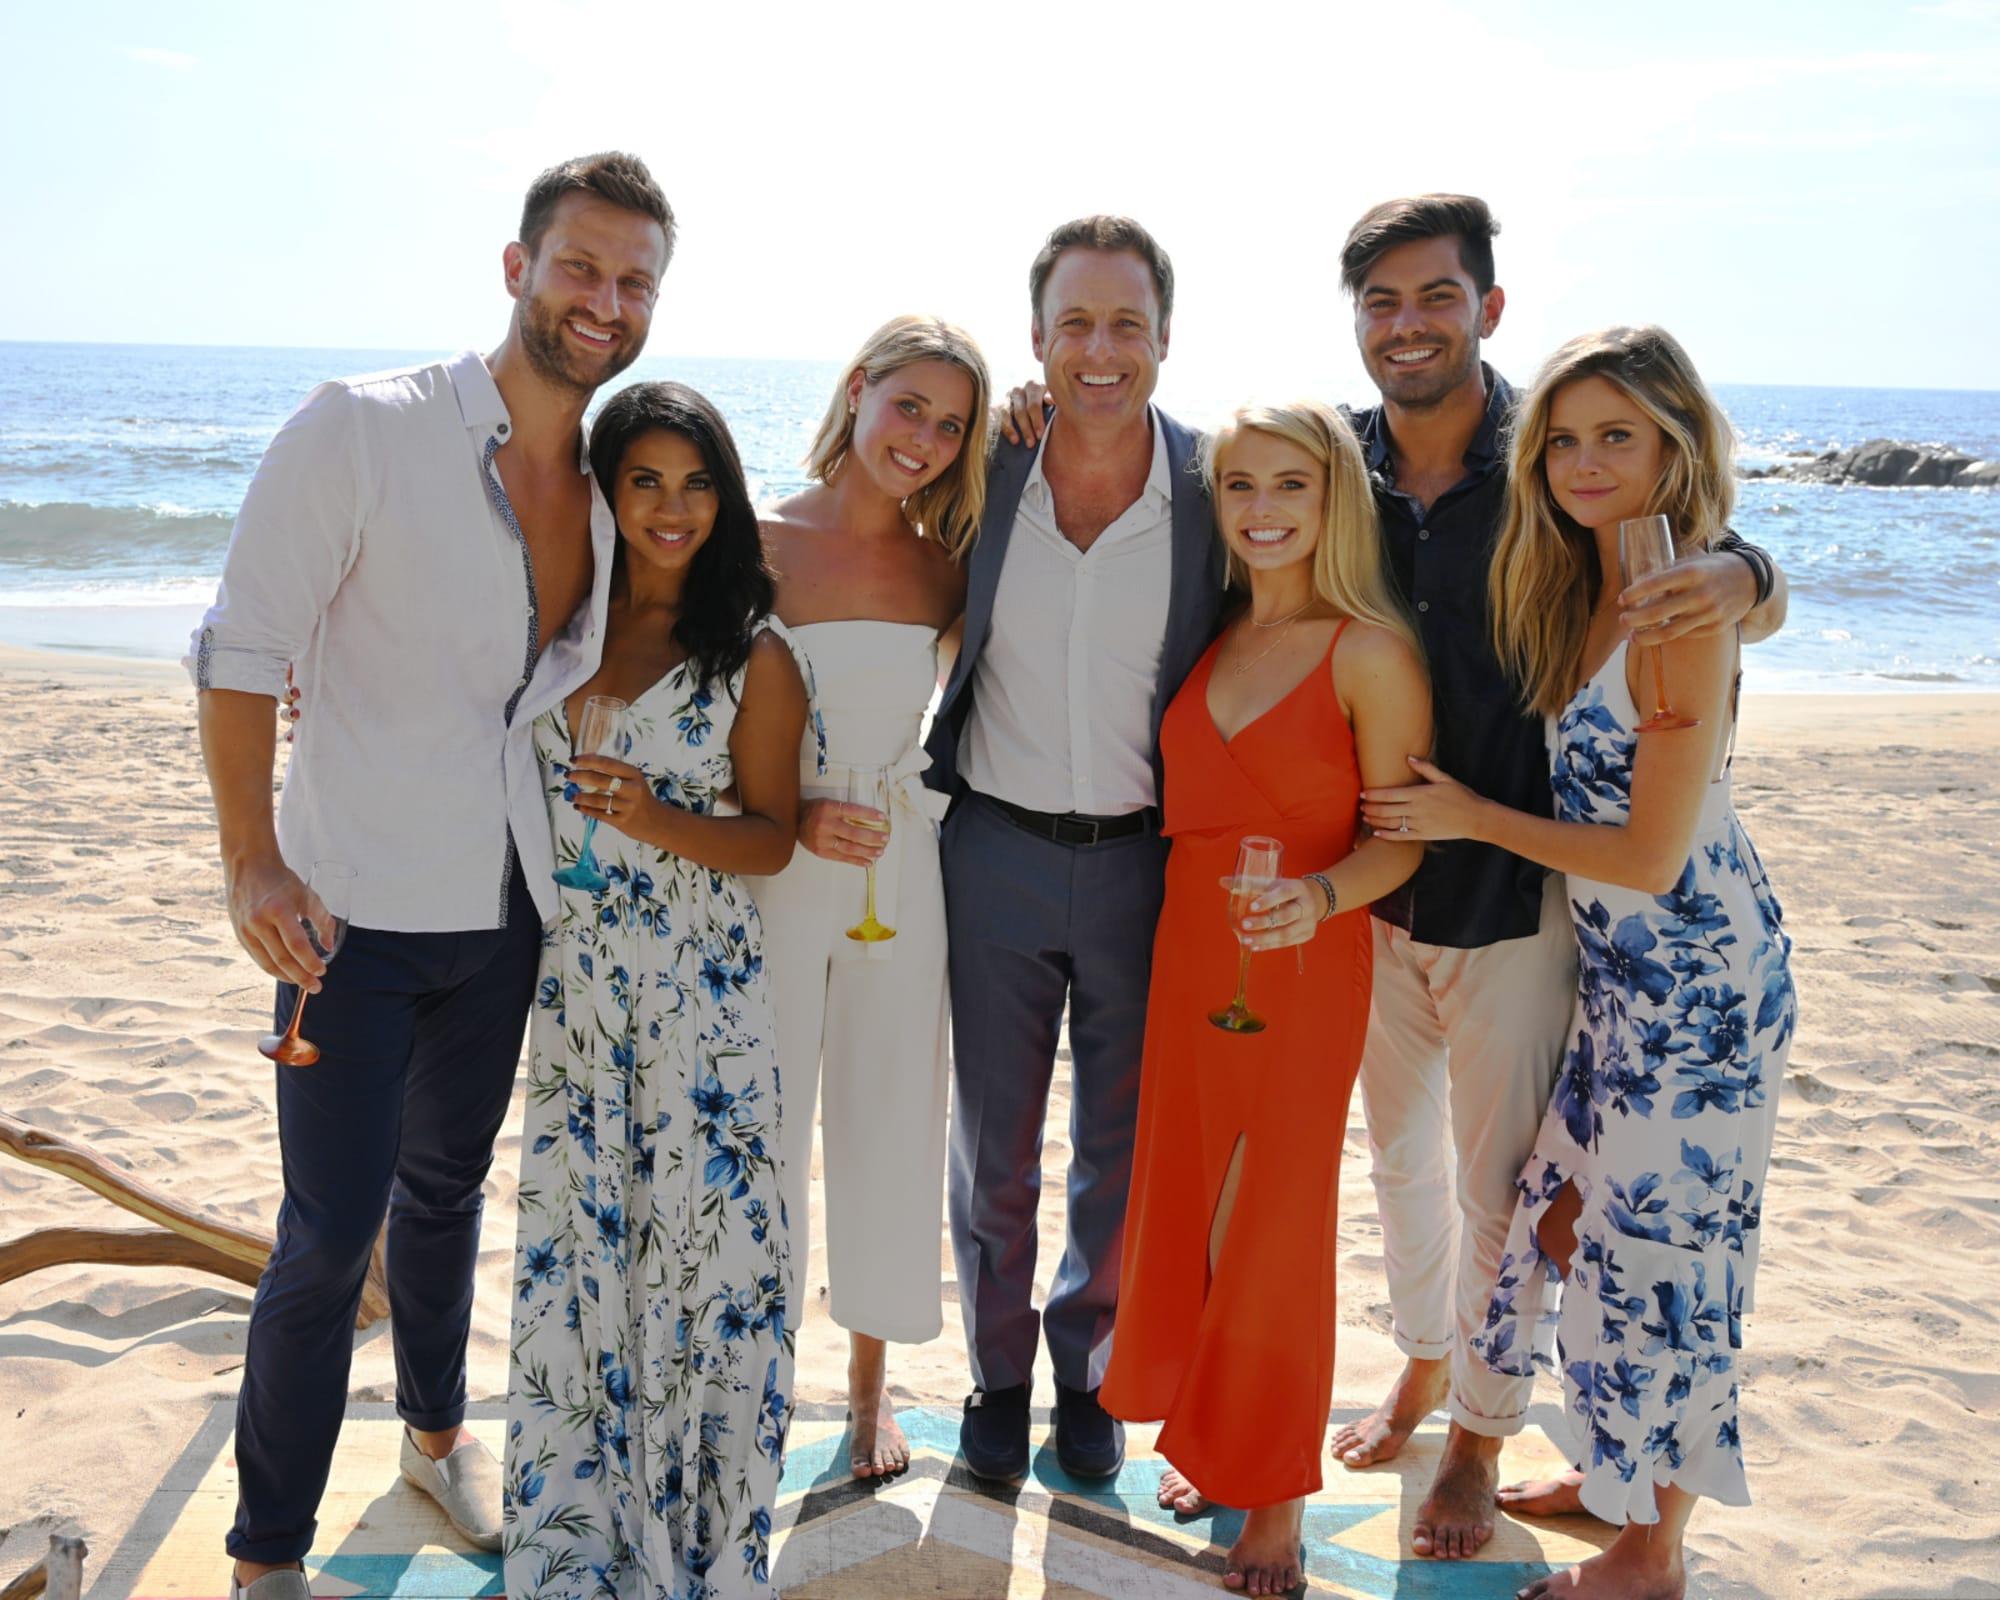 Bachelor in Paradise Season 7 Episode 7